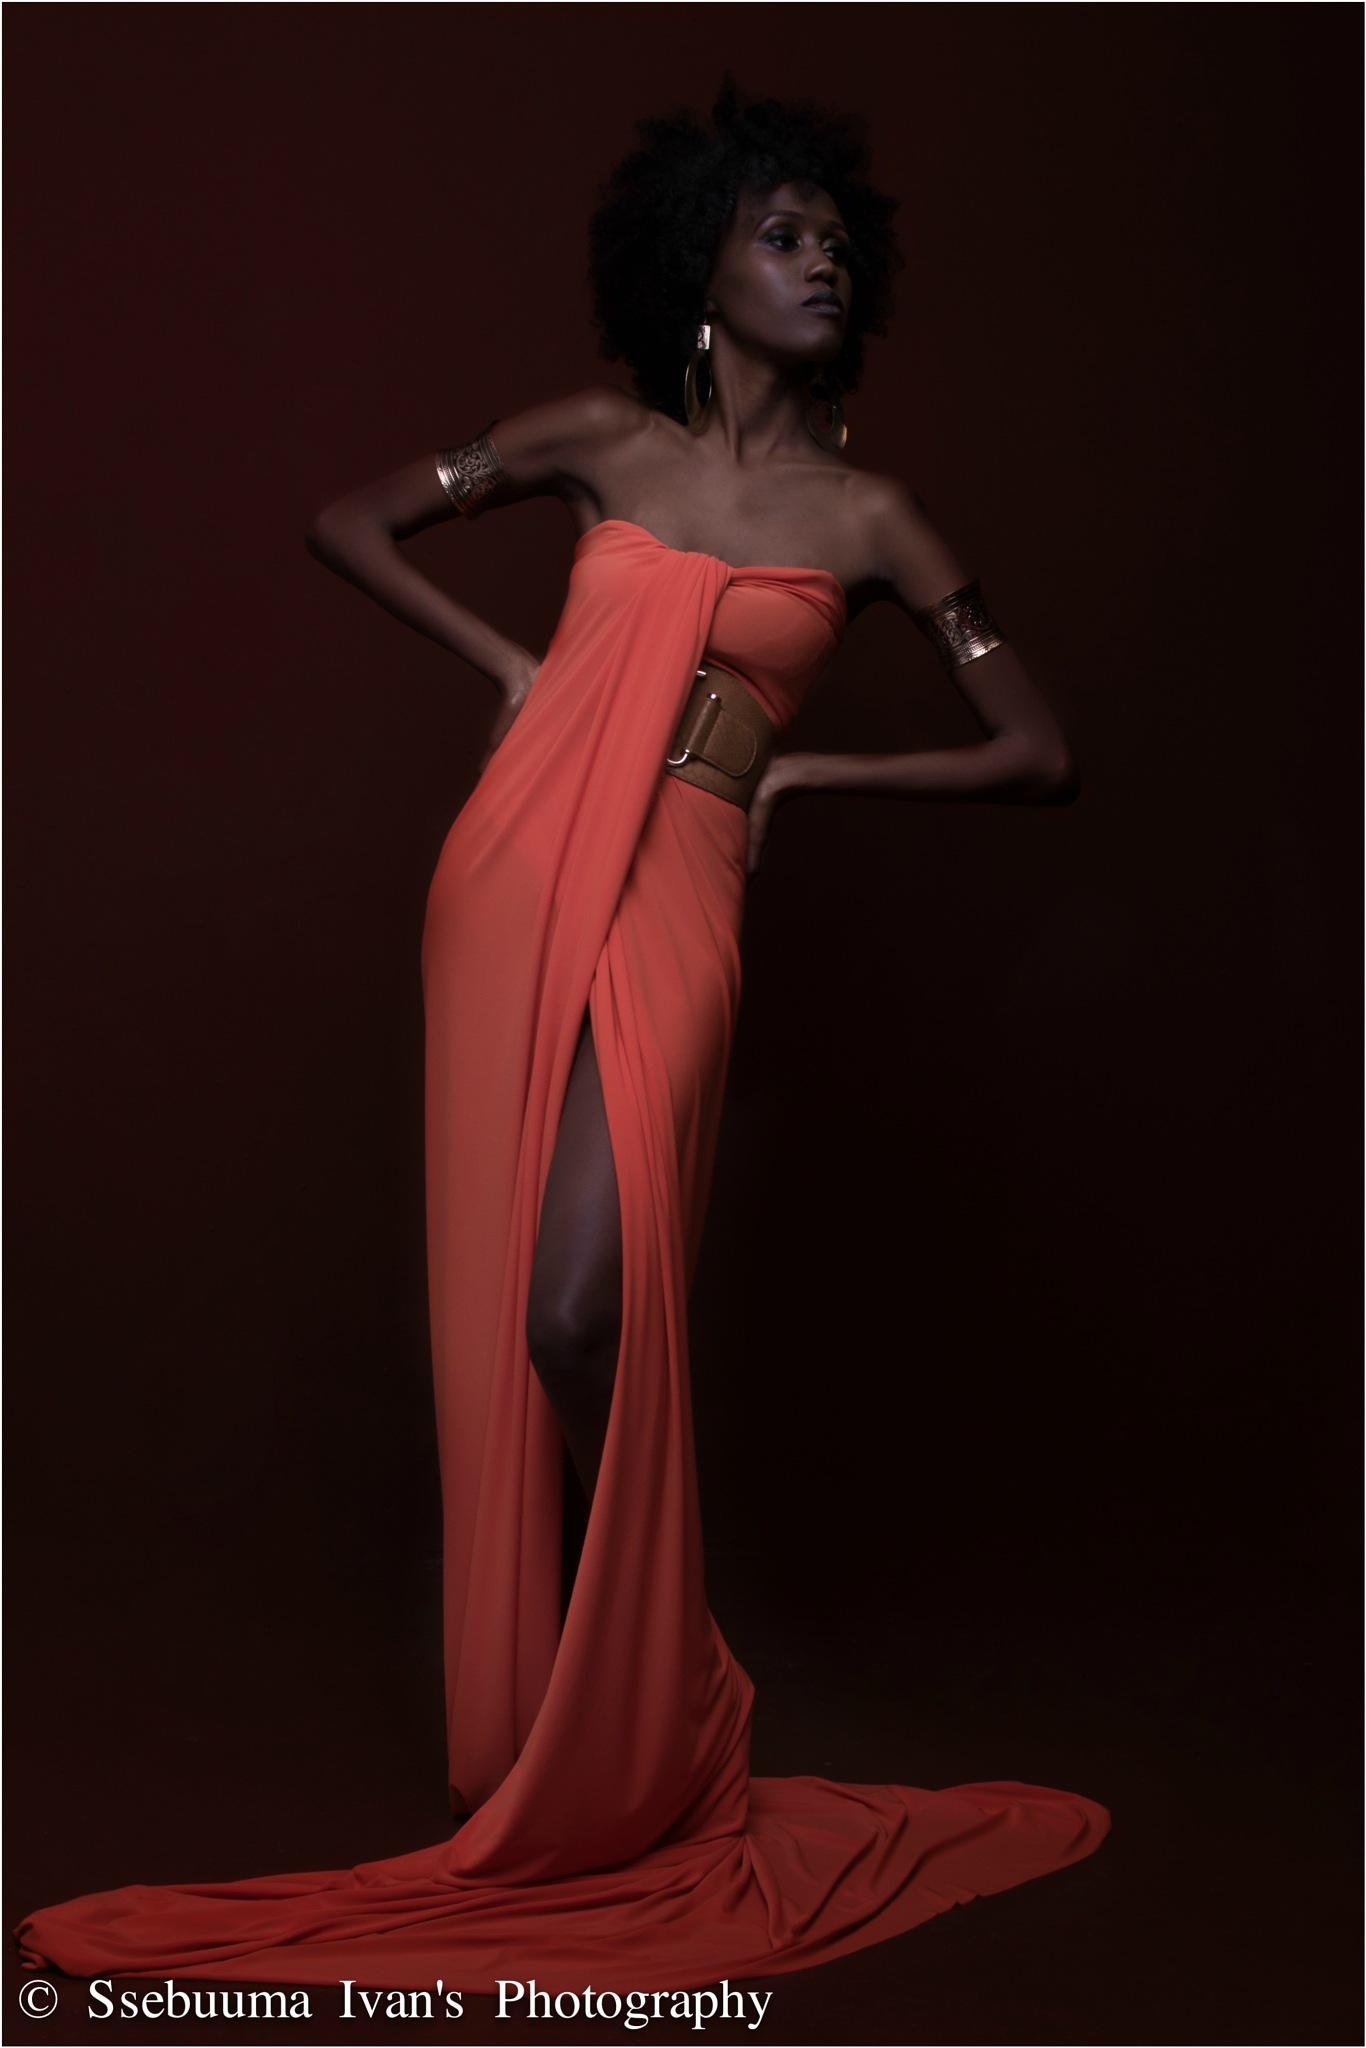 African Beauty by Ssebuuma Ivan